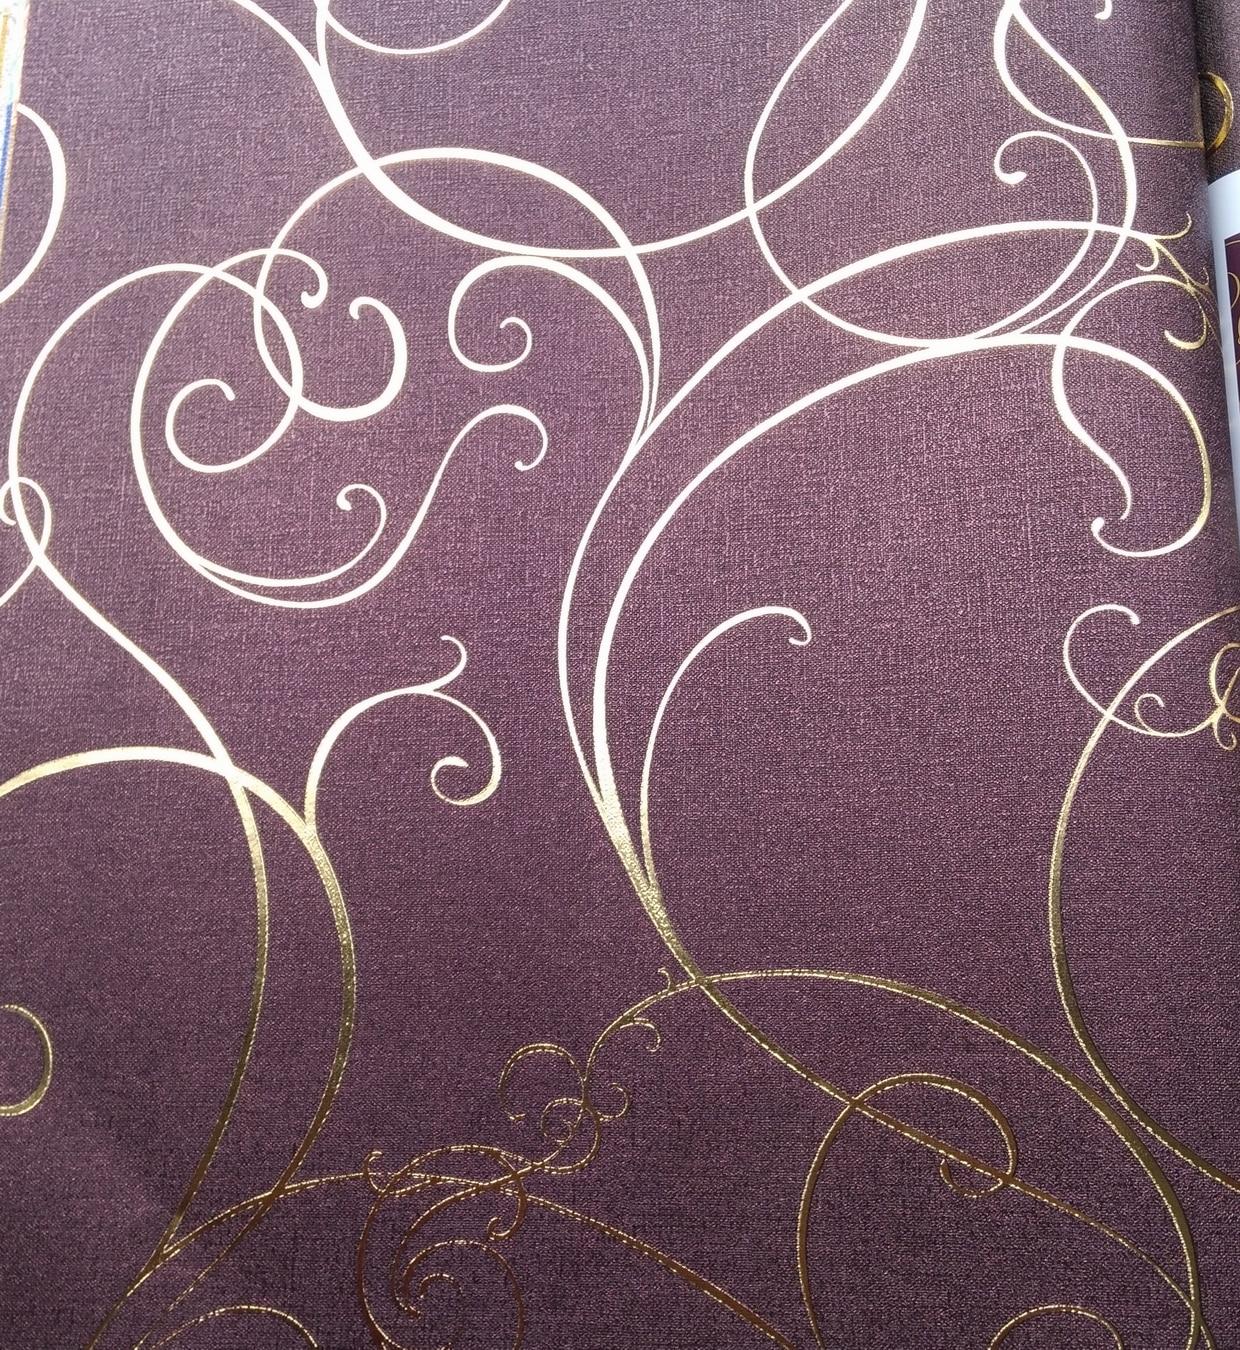 modern living room chocolate wallpaper 8 color wholesale. Black Bedroom Furniture Sets. Home Design Ideas